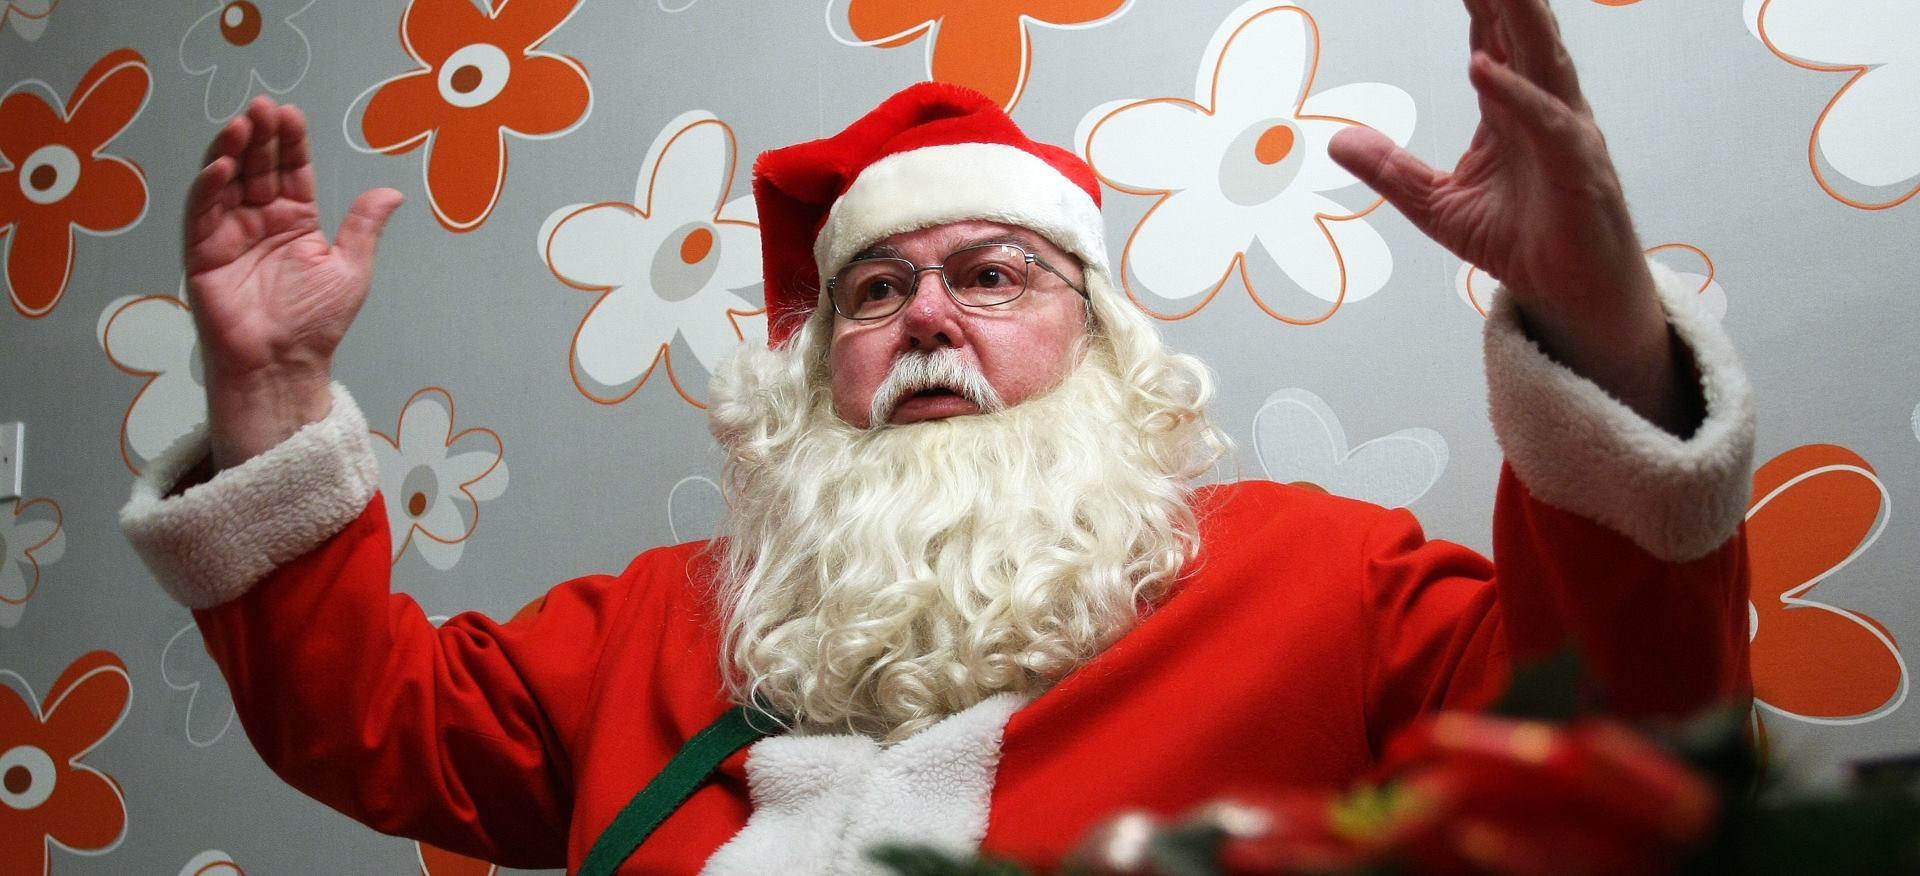 VIDEO: Djed božićnjak 'proletio' iznad Montreuxa